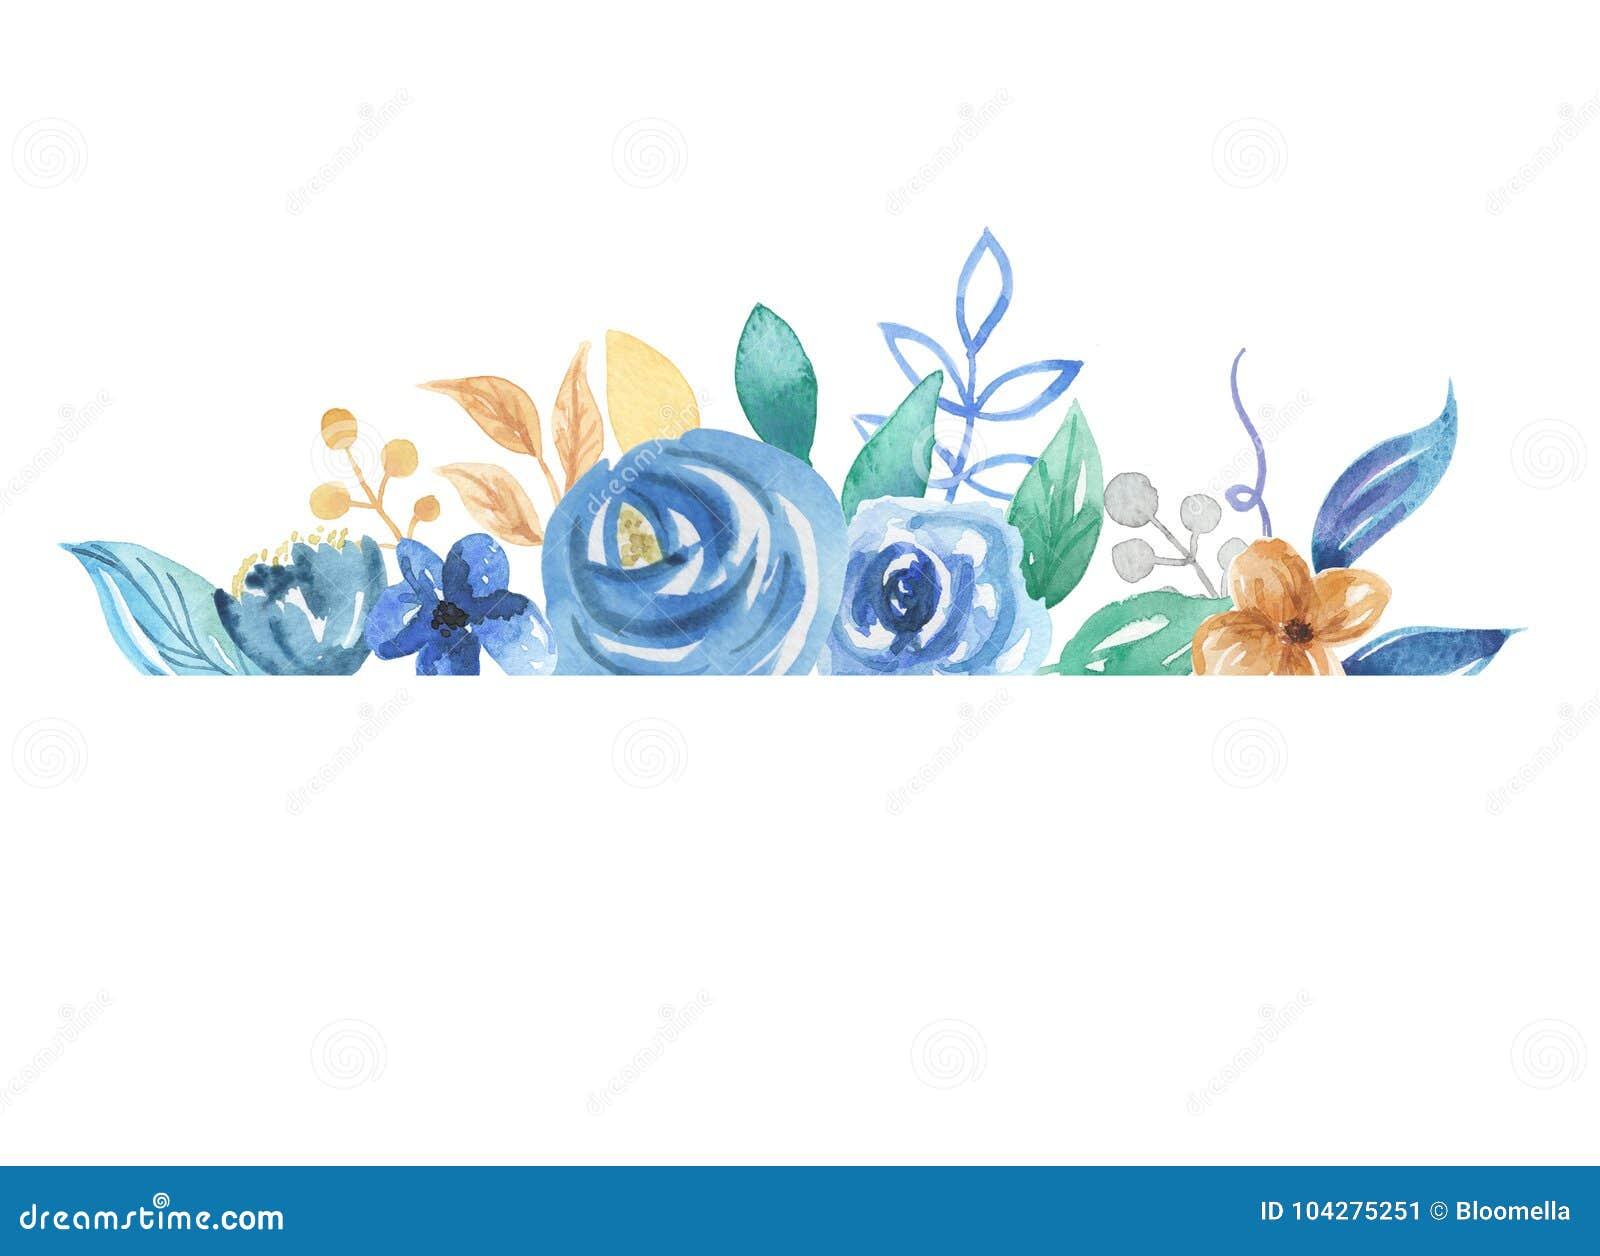 Watercolor Florals Border Blue Berries Leaves Wedding Flowers Stock